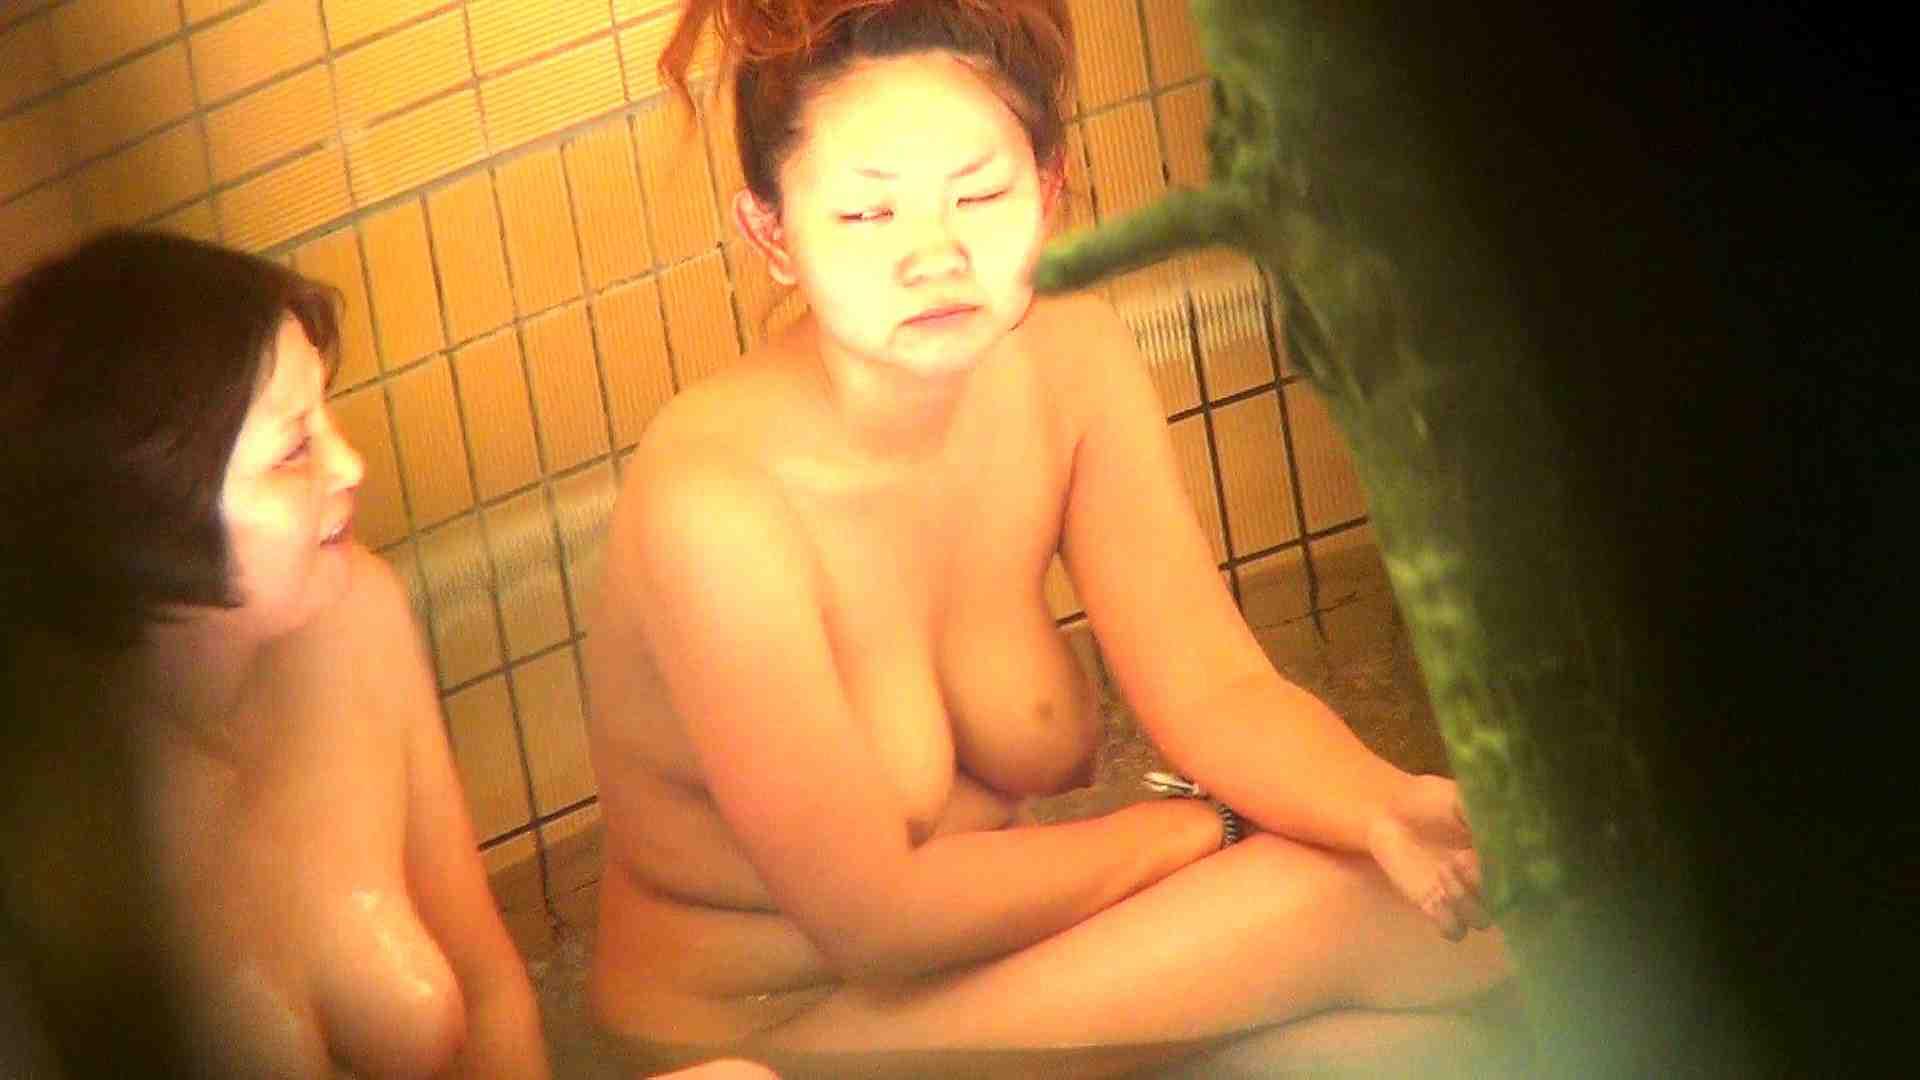 Vol.37 オデブと妊婦とokaasann 妊婦 性交動画流出 44連発 27